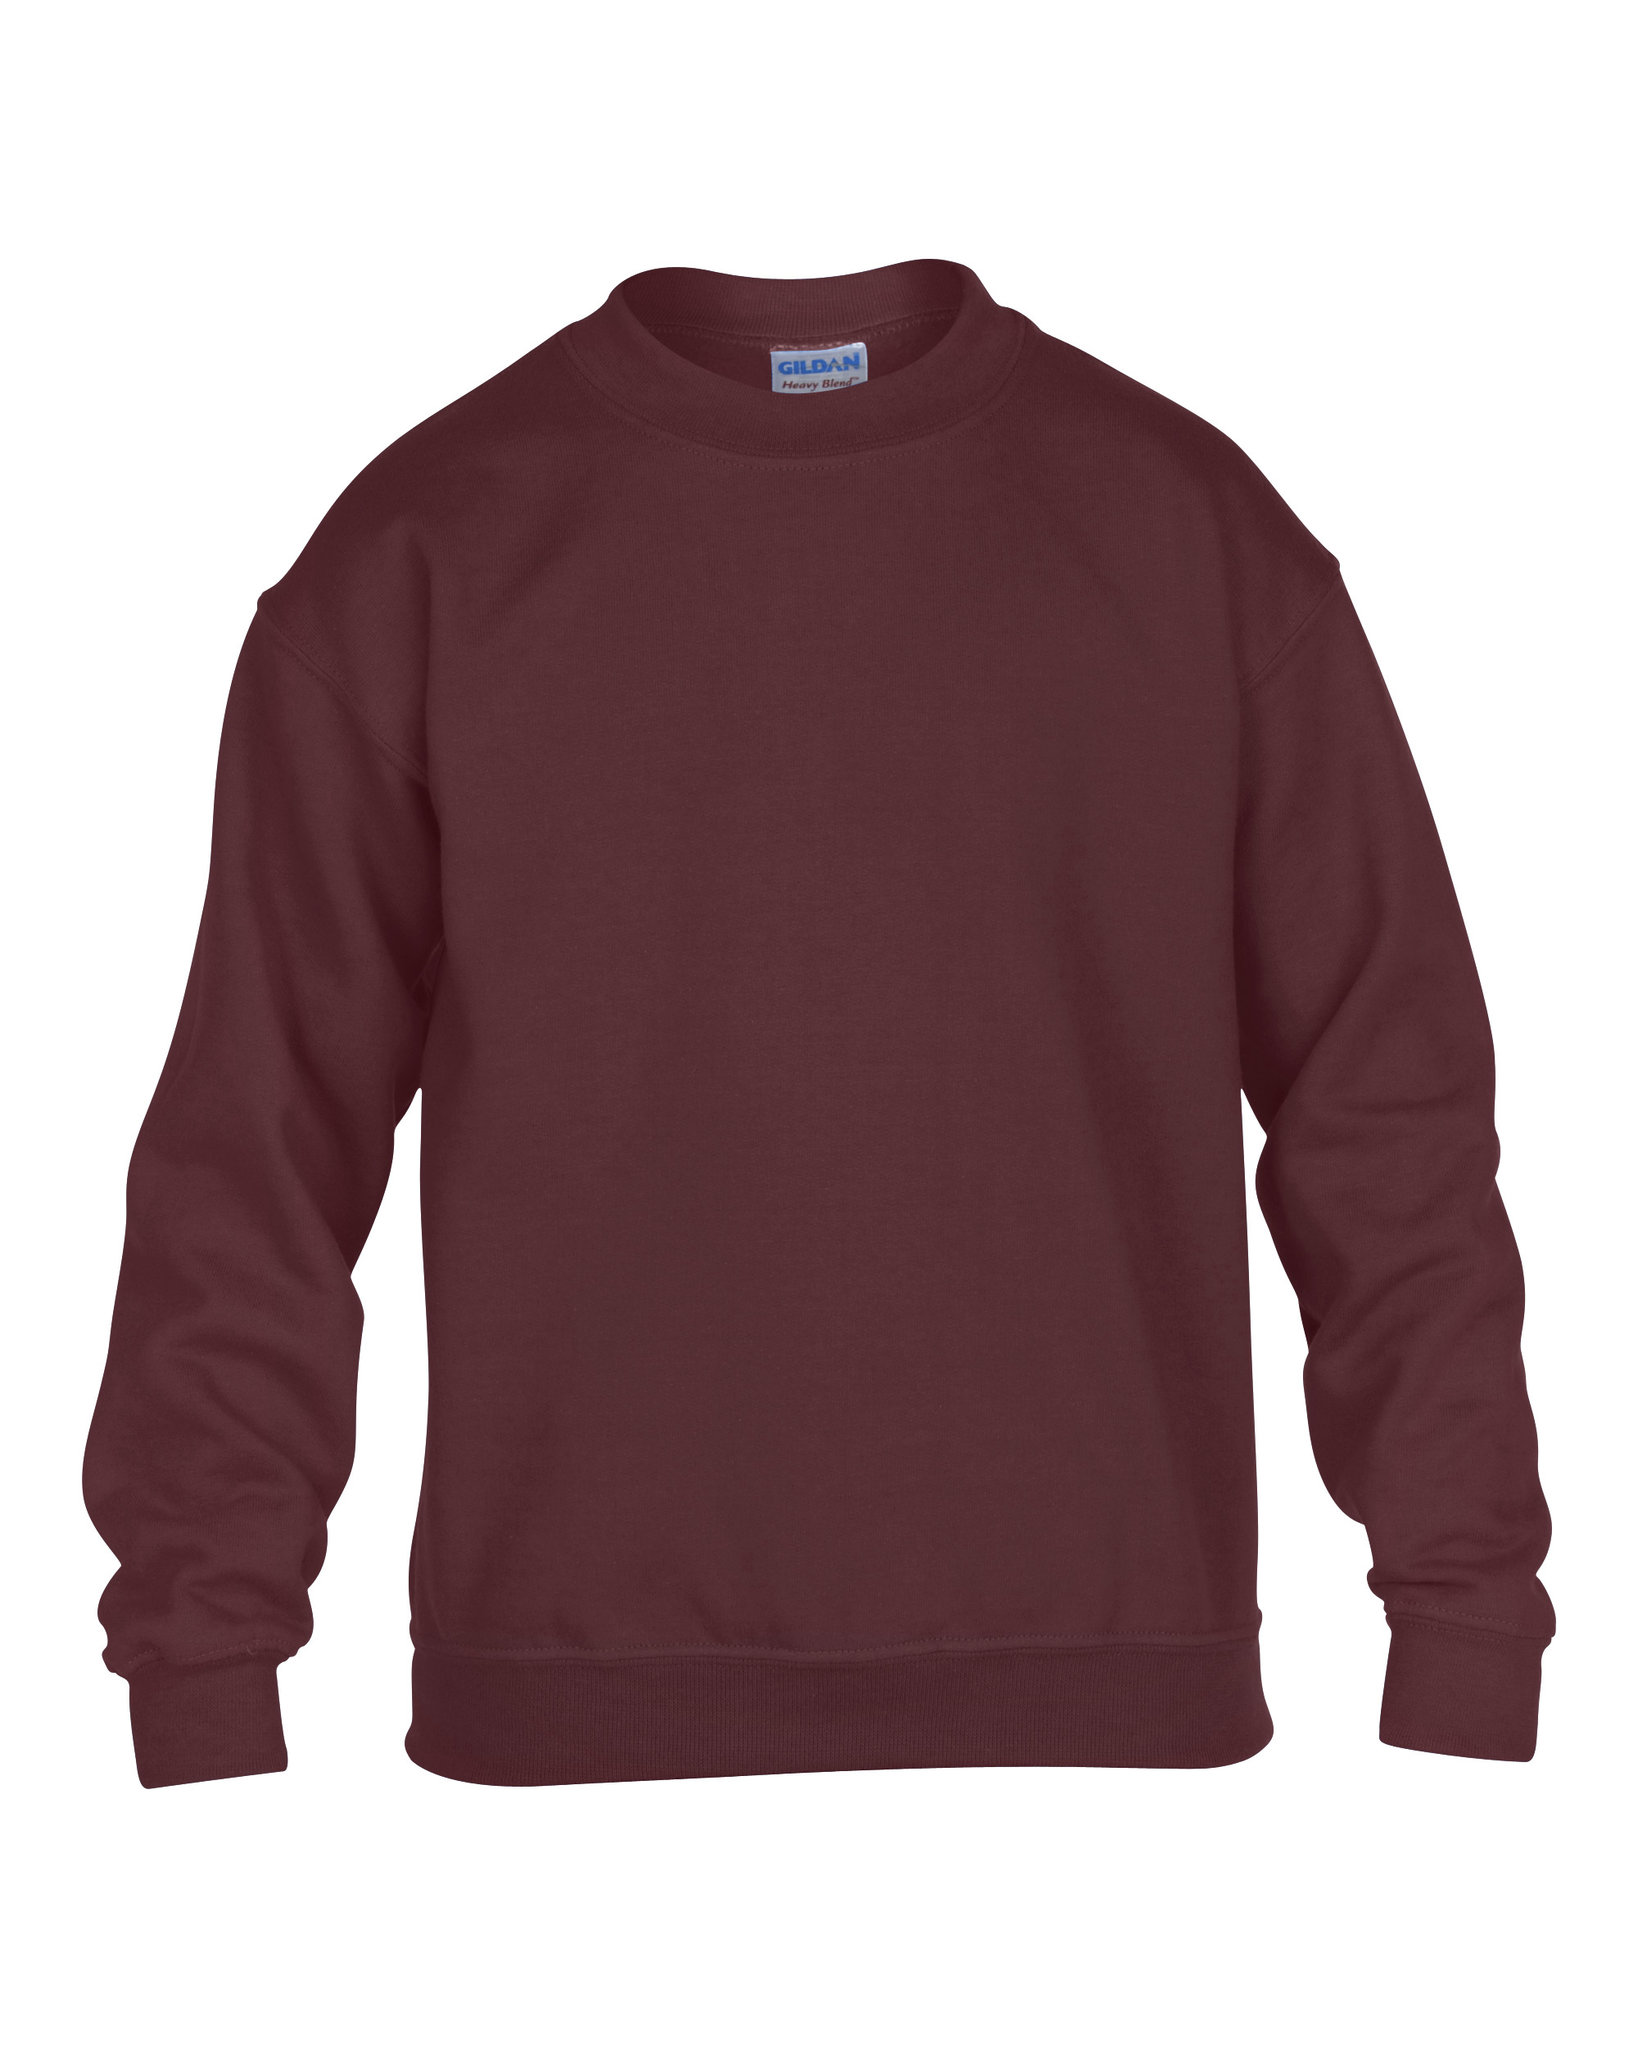 Sweatshirt personnalisable Crewneck marron - sweatshirt promotionnel